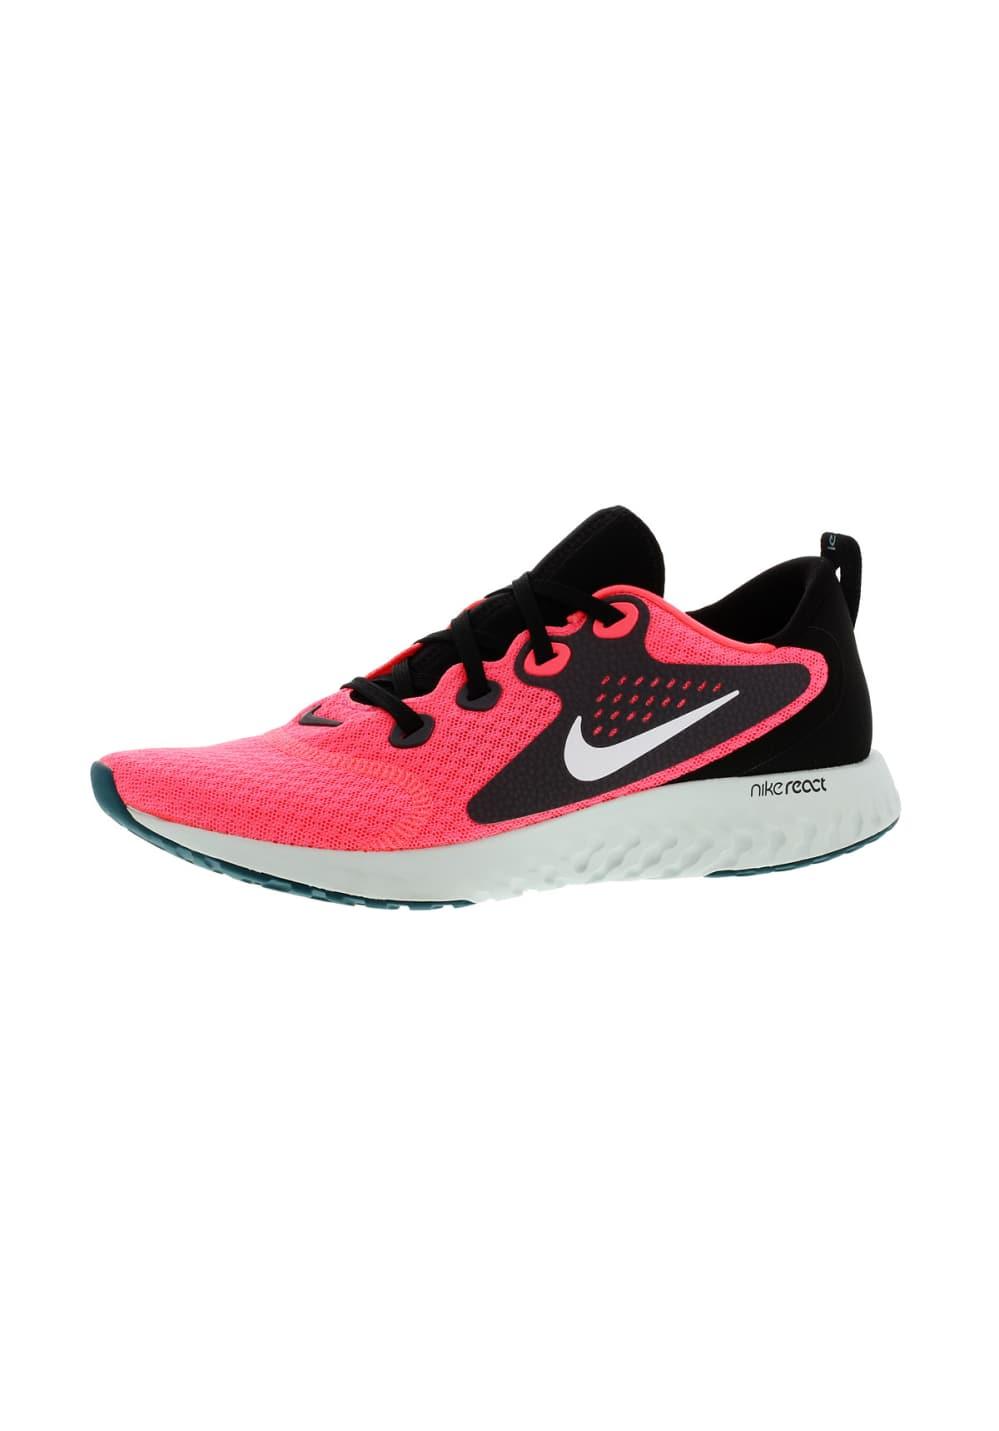 9498075e944a9 Nike Legend React - Running shoes for Women - Pink